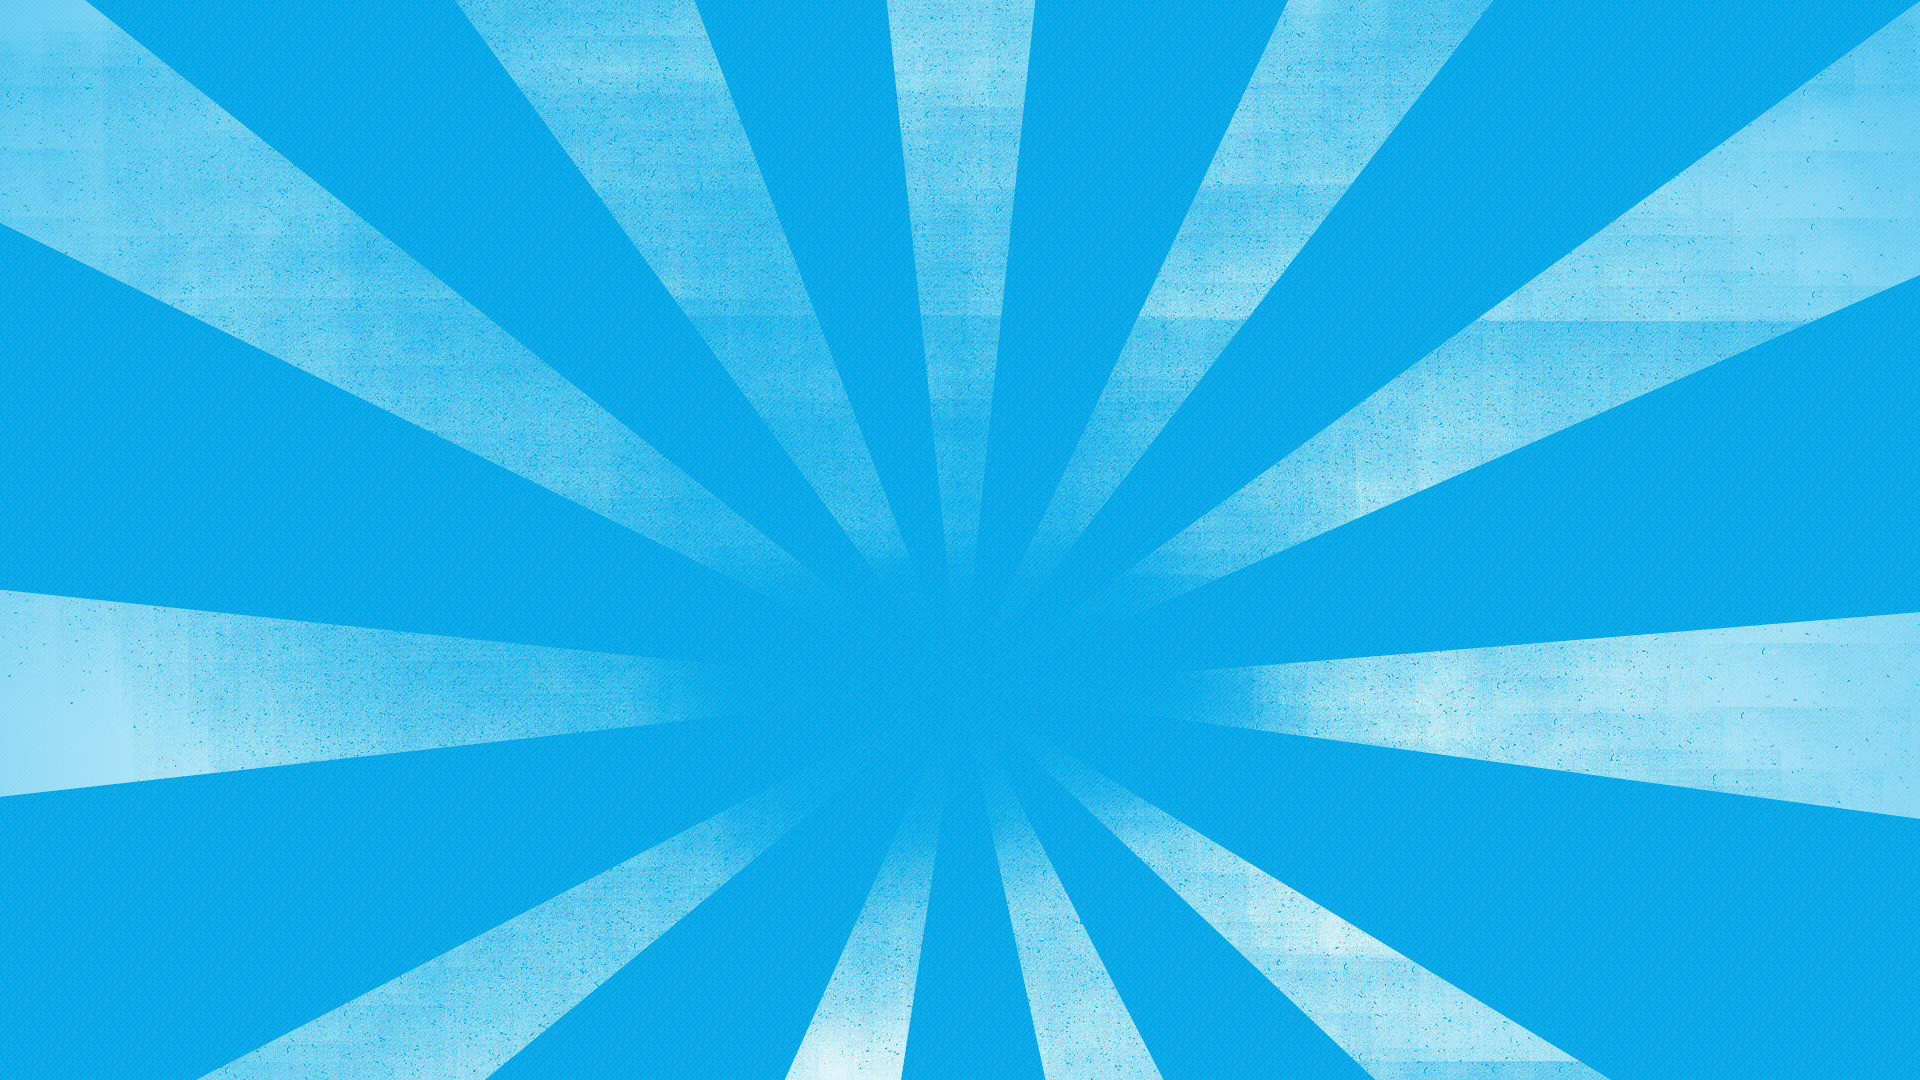 Blue Wallpaper 1920x1080 75 Images